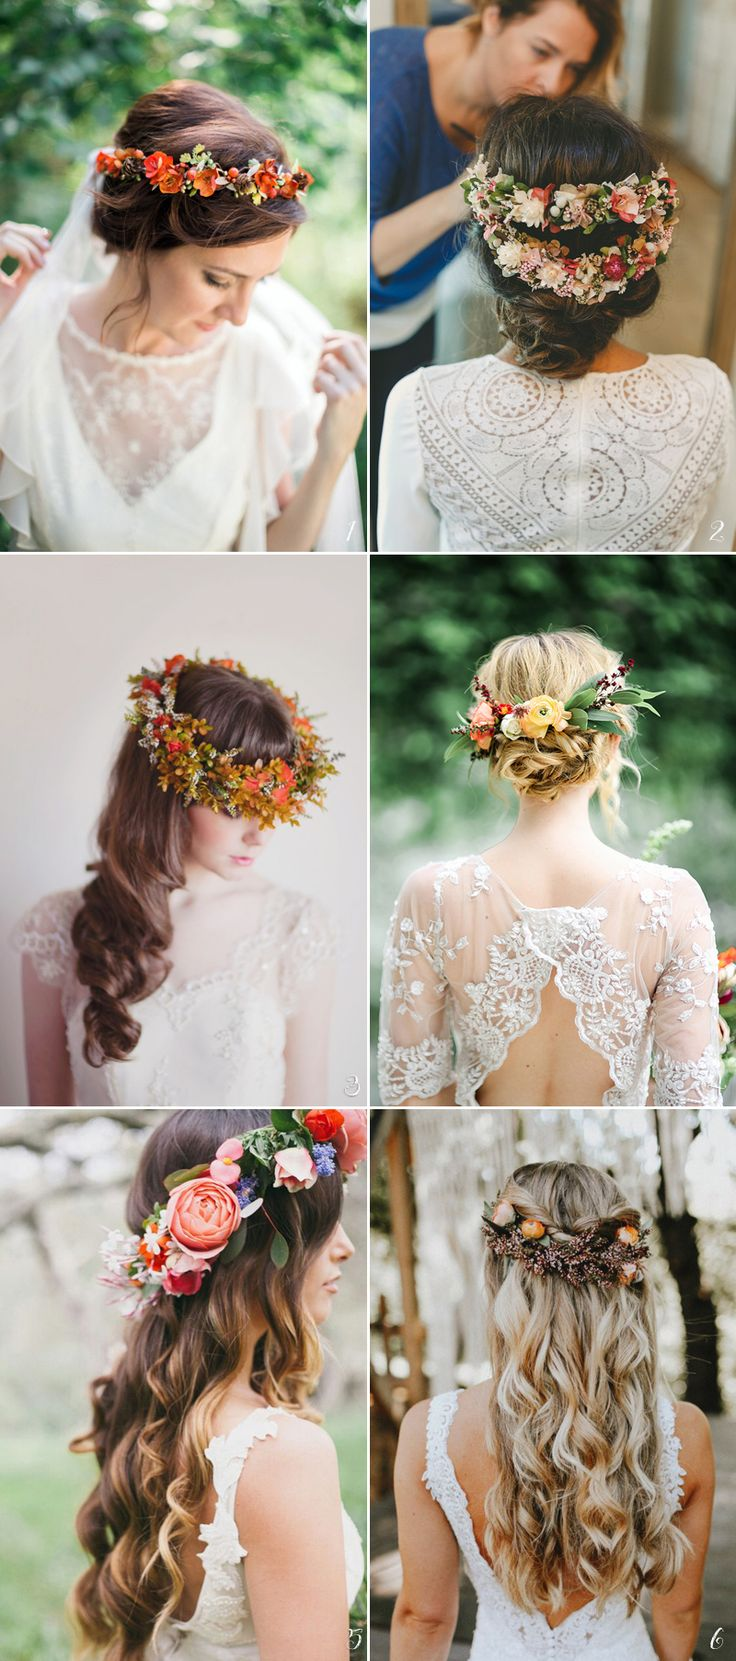 Best 25 Vintage Wedding Hairstyles Ideas On Pinterest: Top 25+ Best Elegant Wedding Hairstyles Ideas On Pinterest